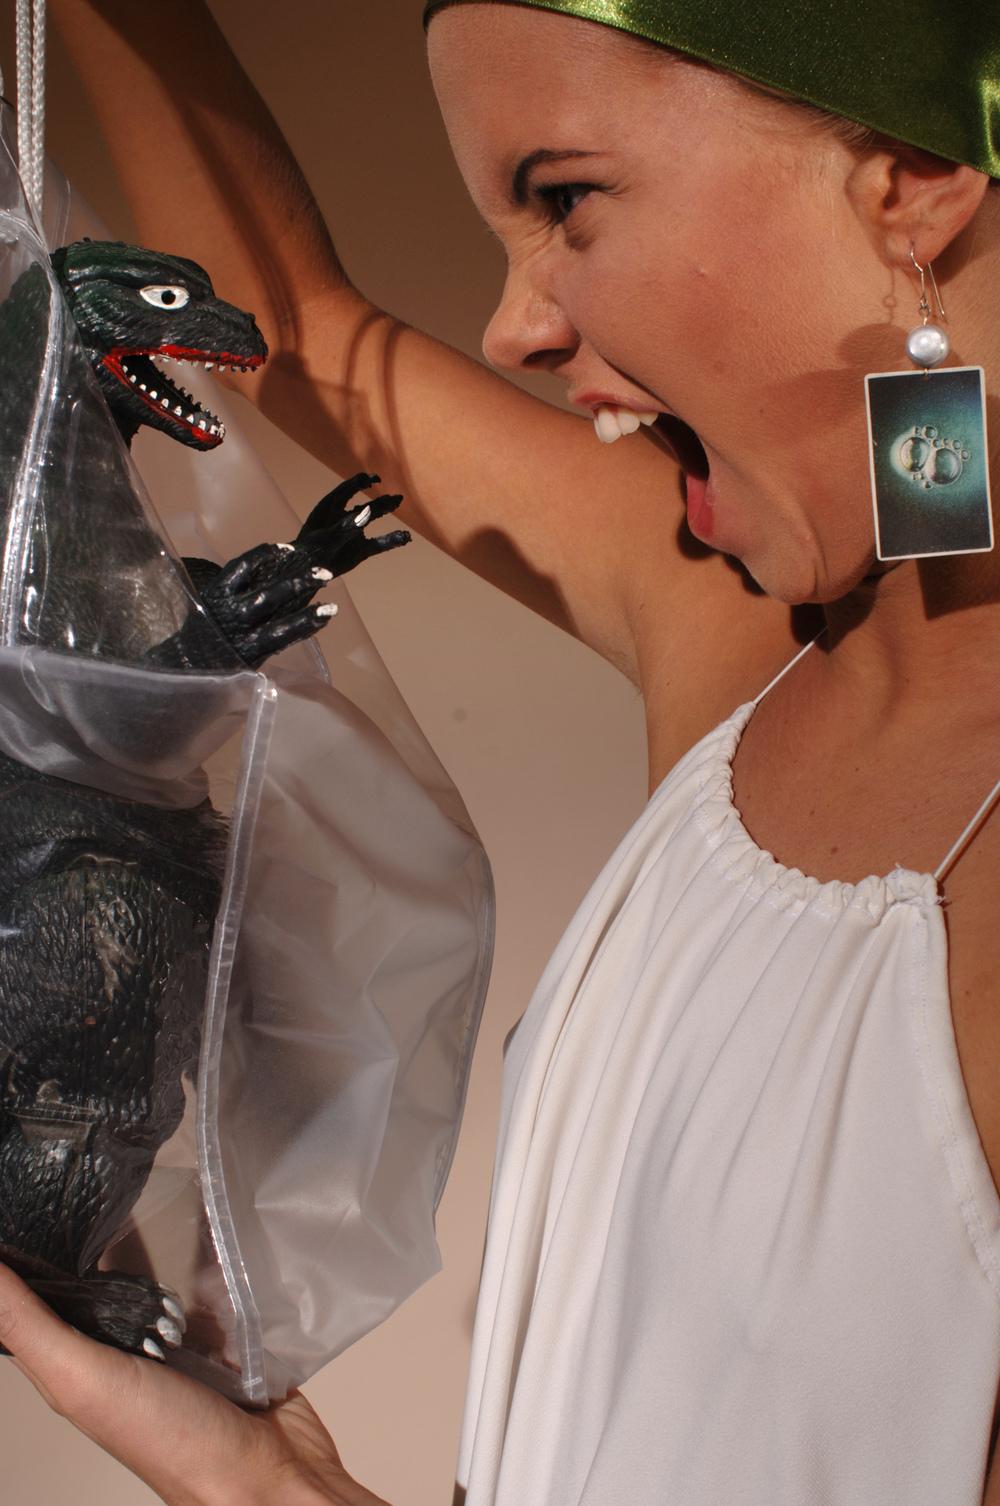 Girl screaming at a dinosaur in a bag